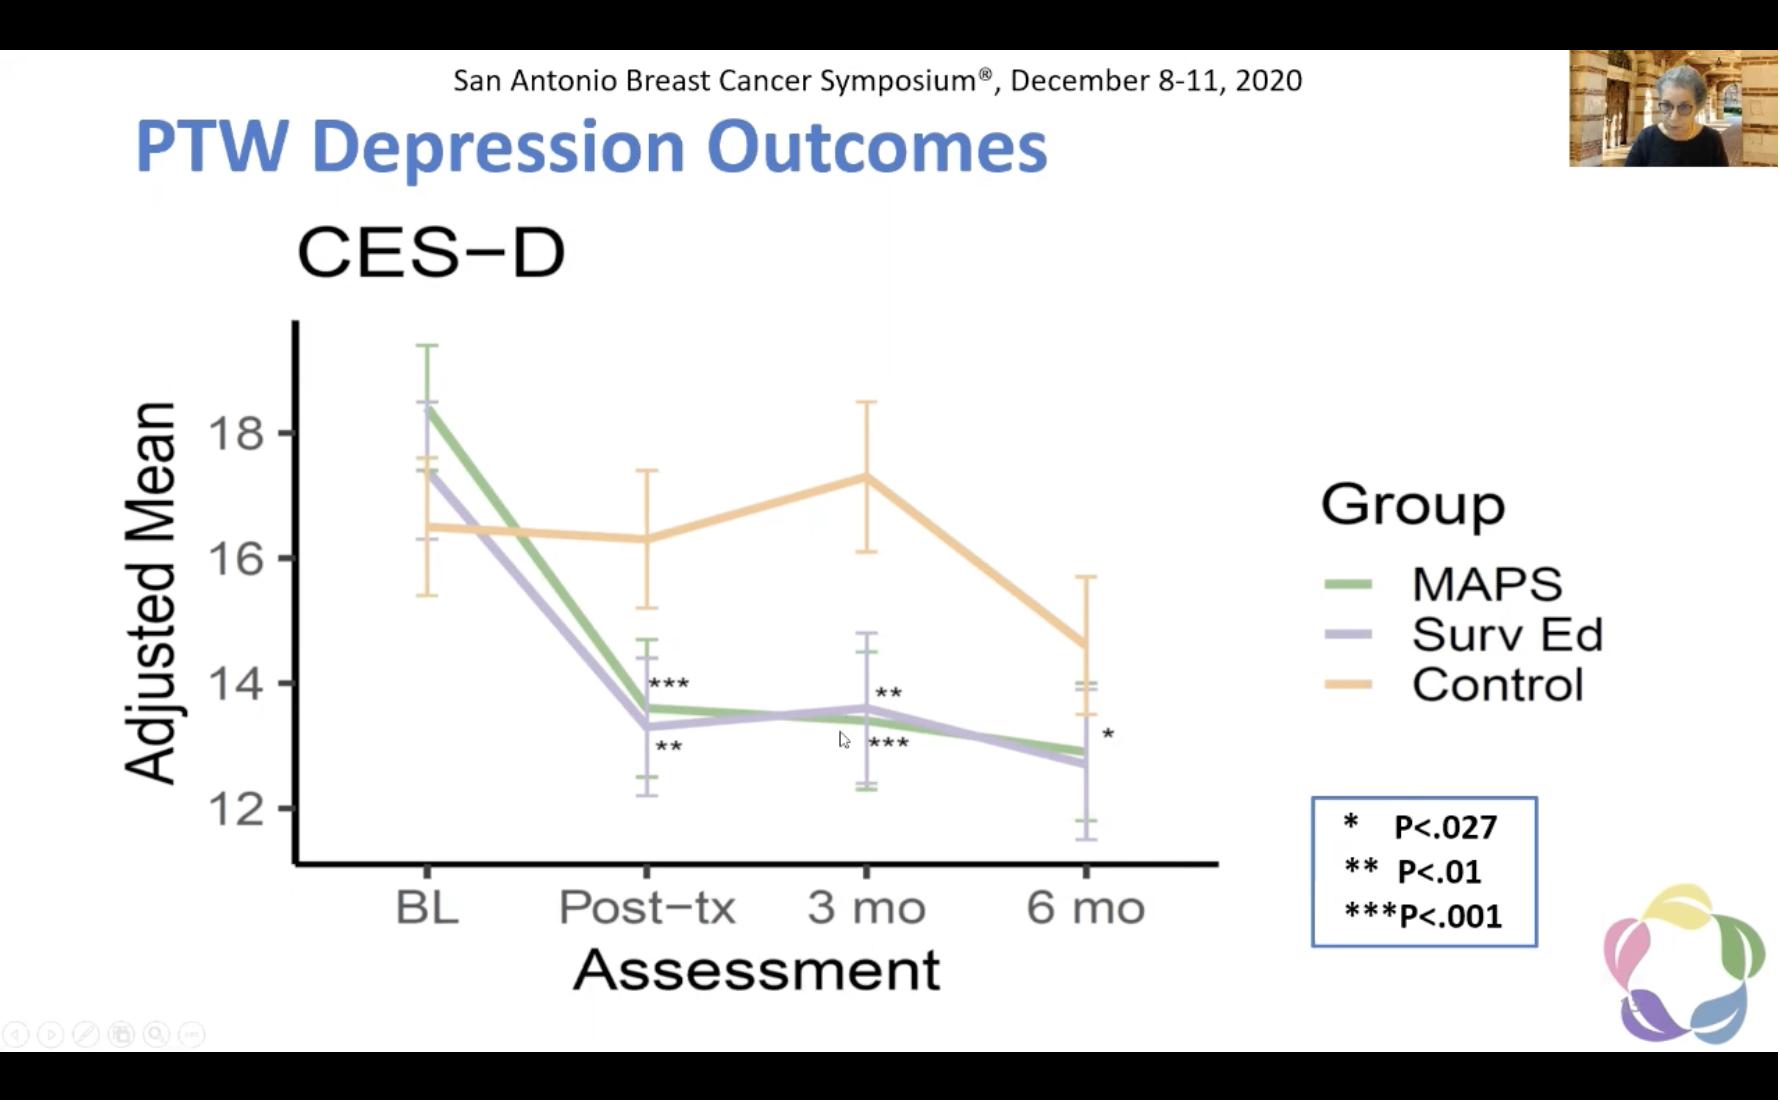 Screen Shot from SABCS General Session 2 Presentation on Mindfulness